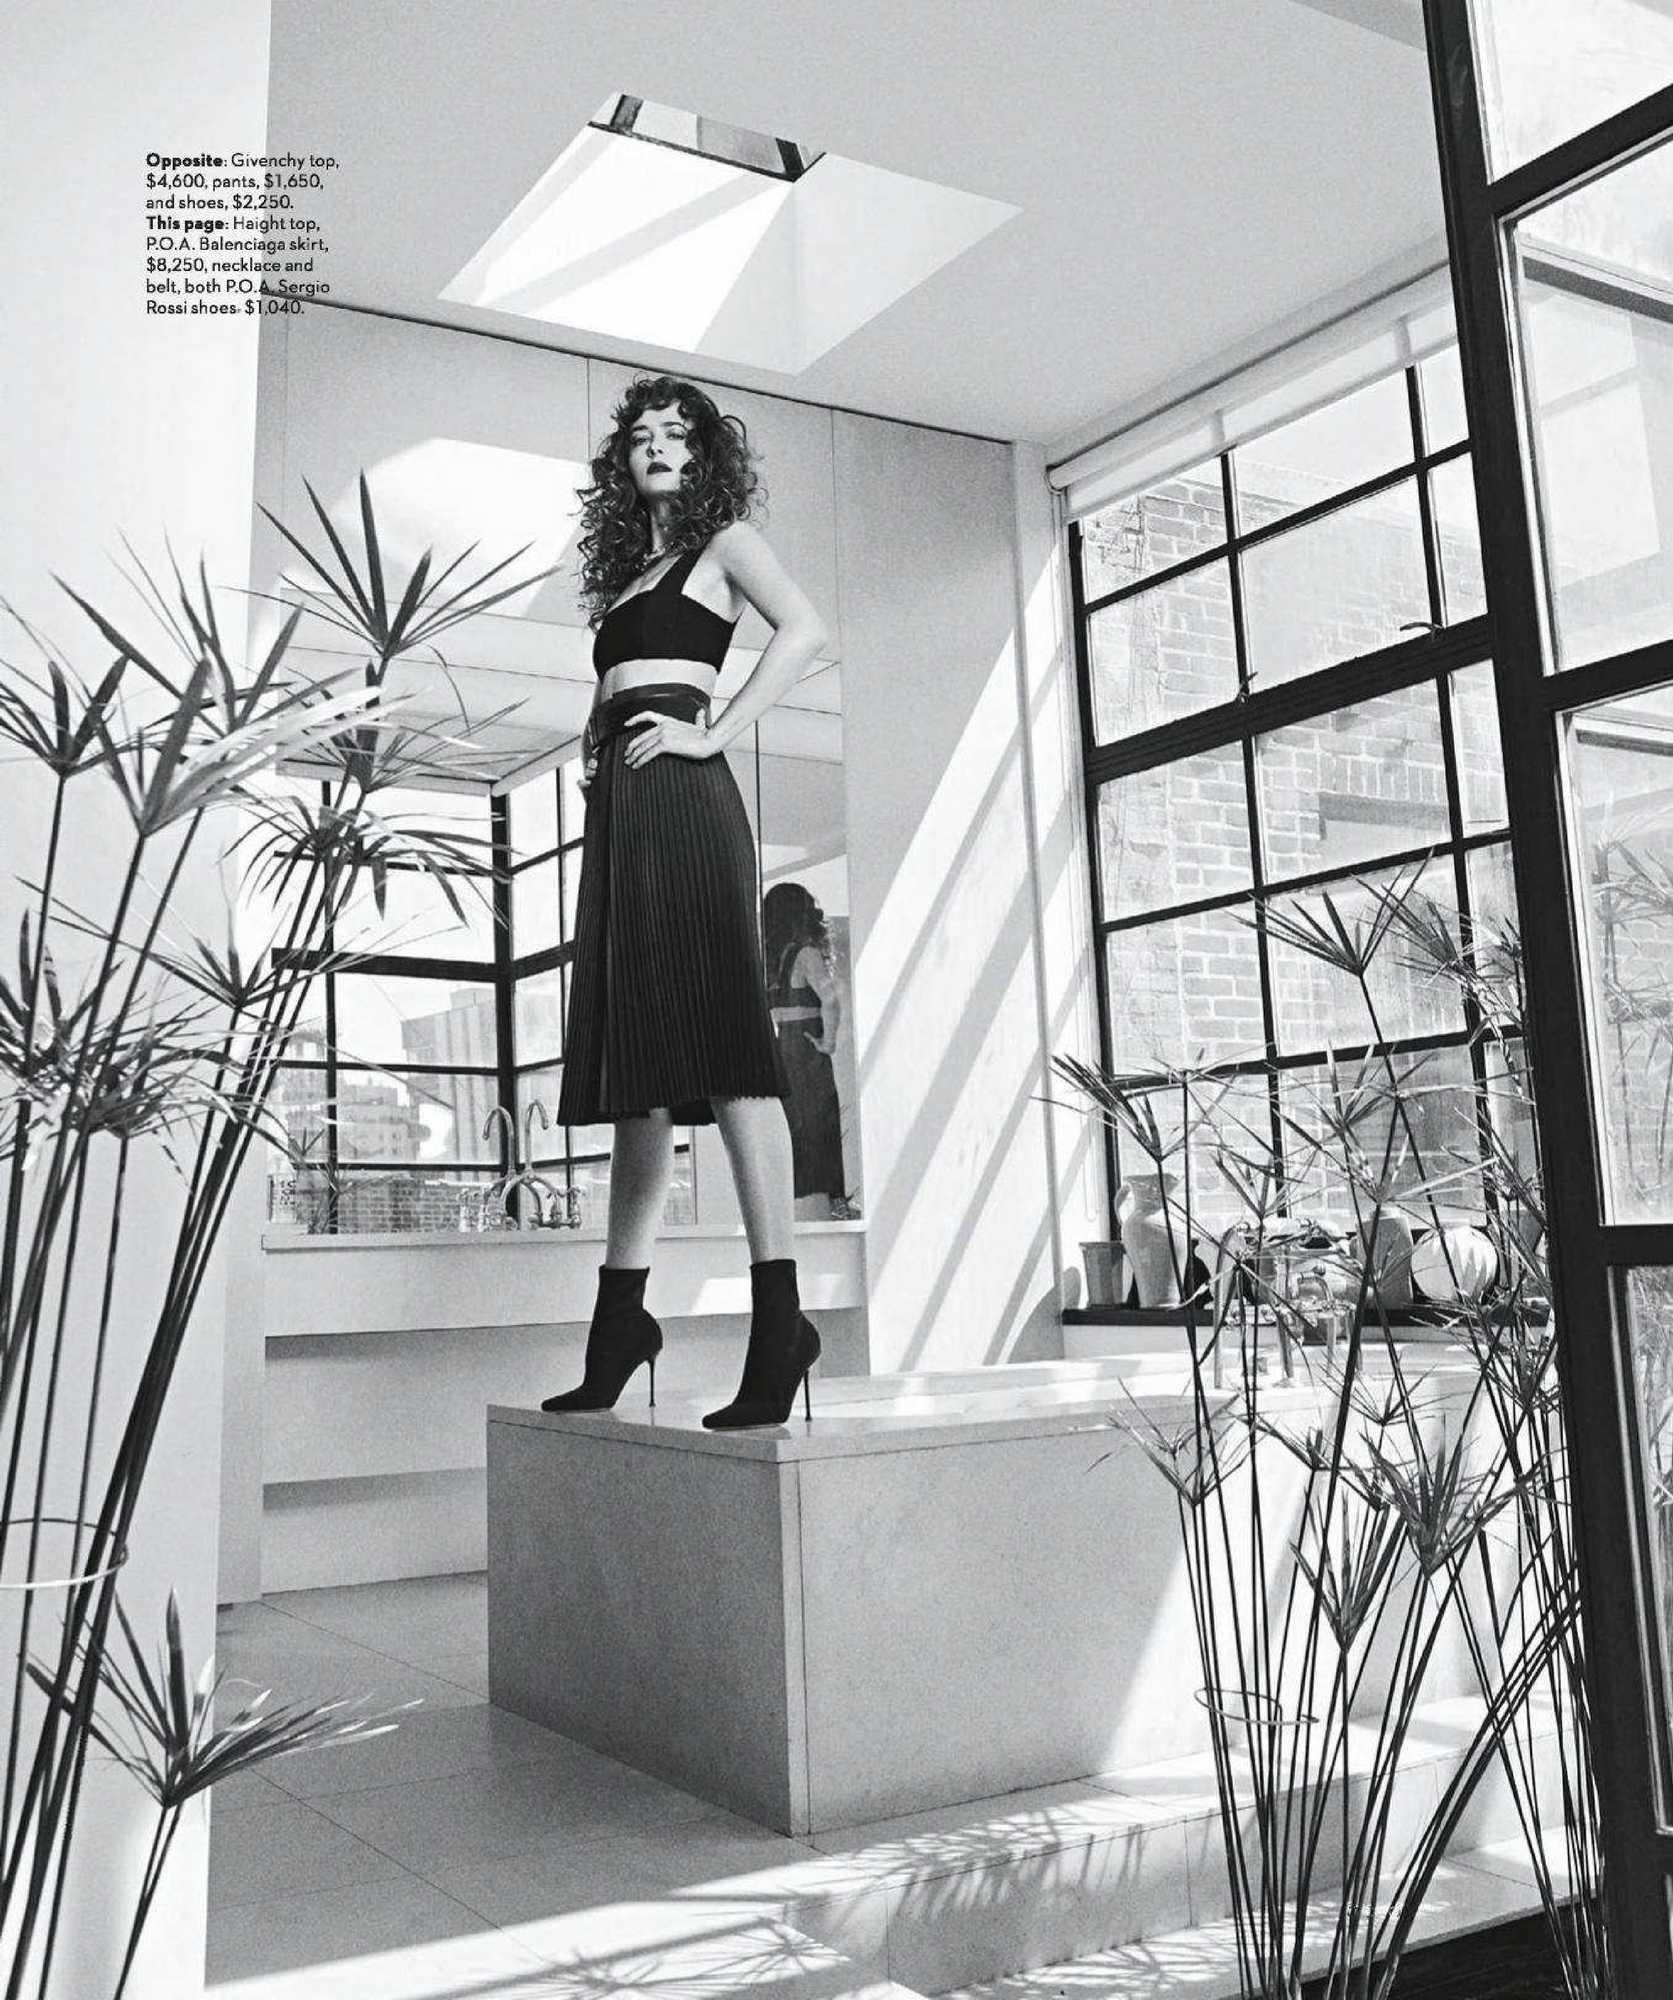 Dakota-Johnson-Emma-Summerton-Photoshoot-for-Vogue-Australia-October-20182a86e1982742034.jpg